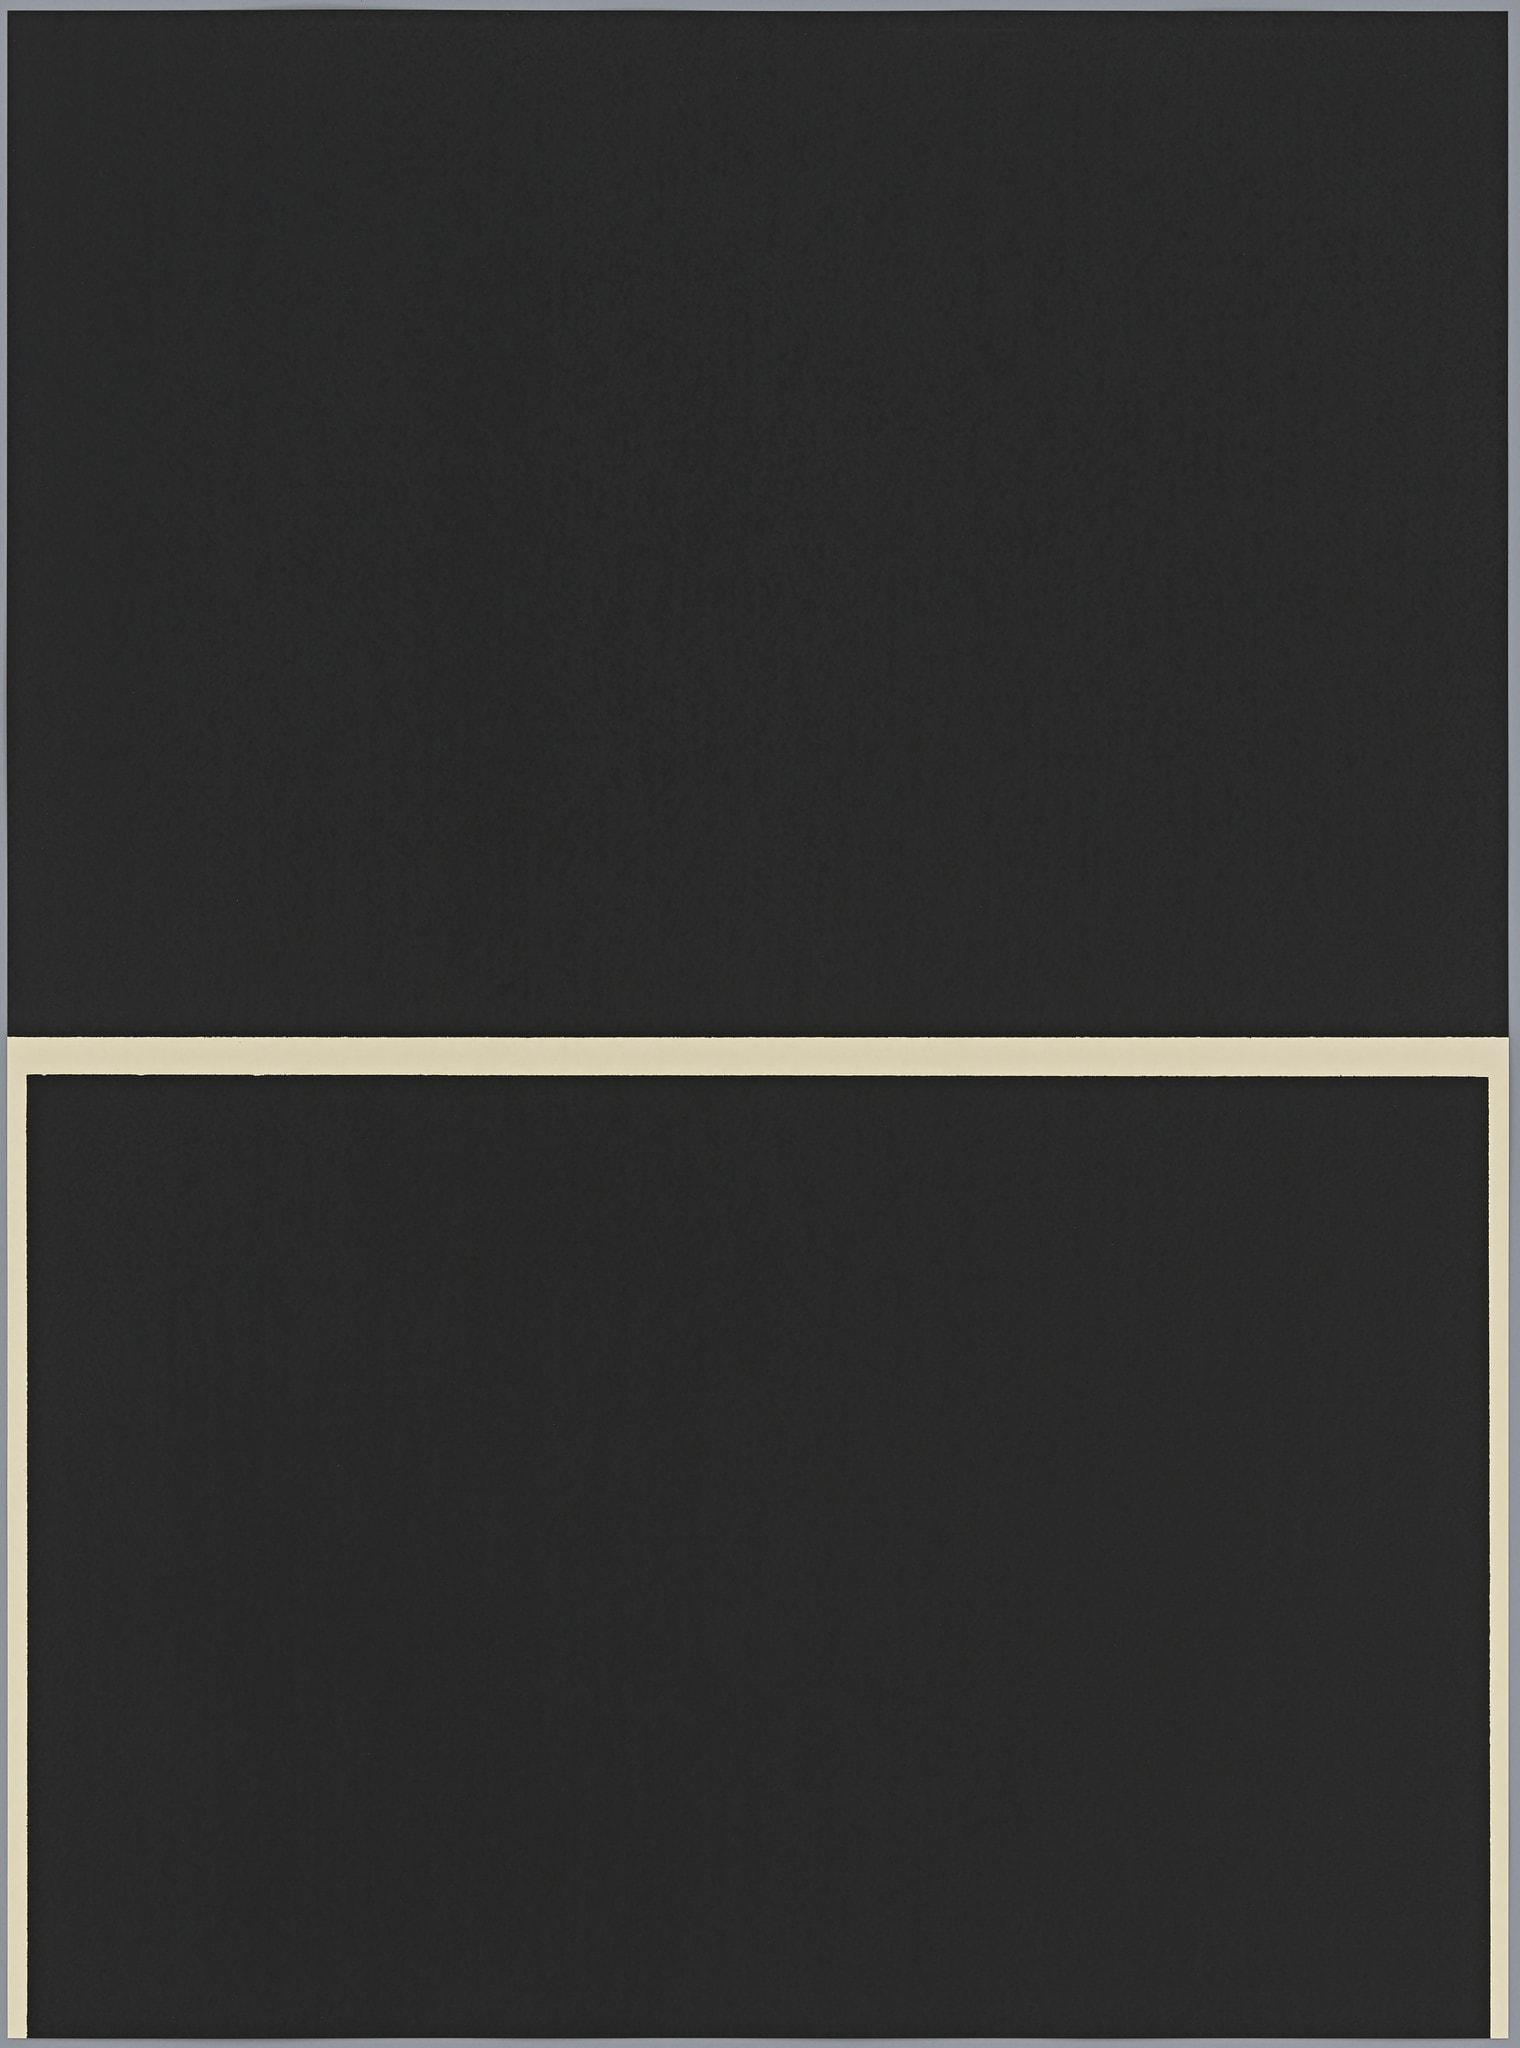 Double Level III by Richard Serra